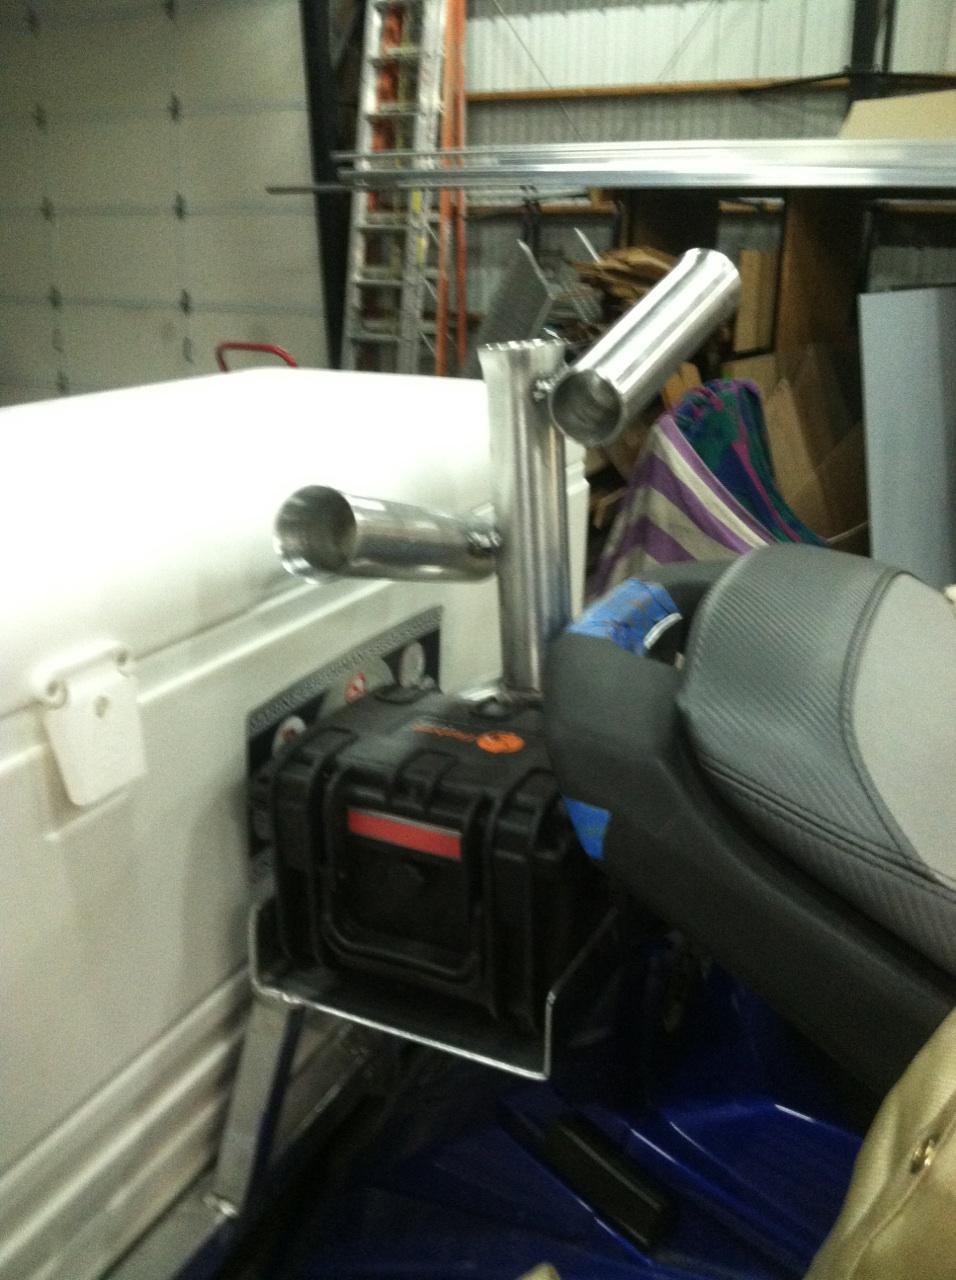 Auxiliary Battery for Jetski Fishing